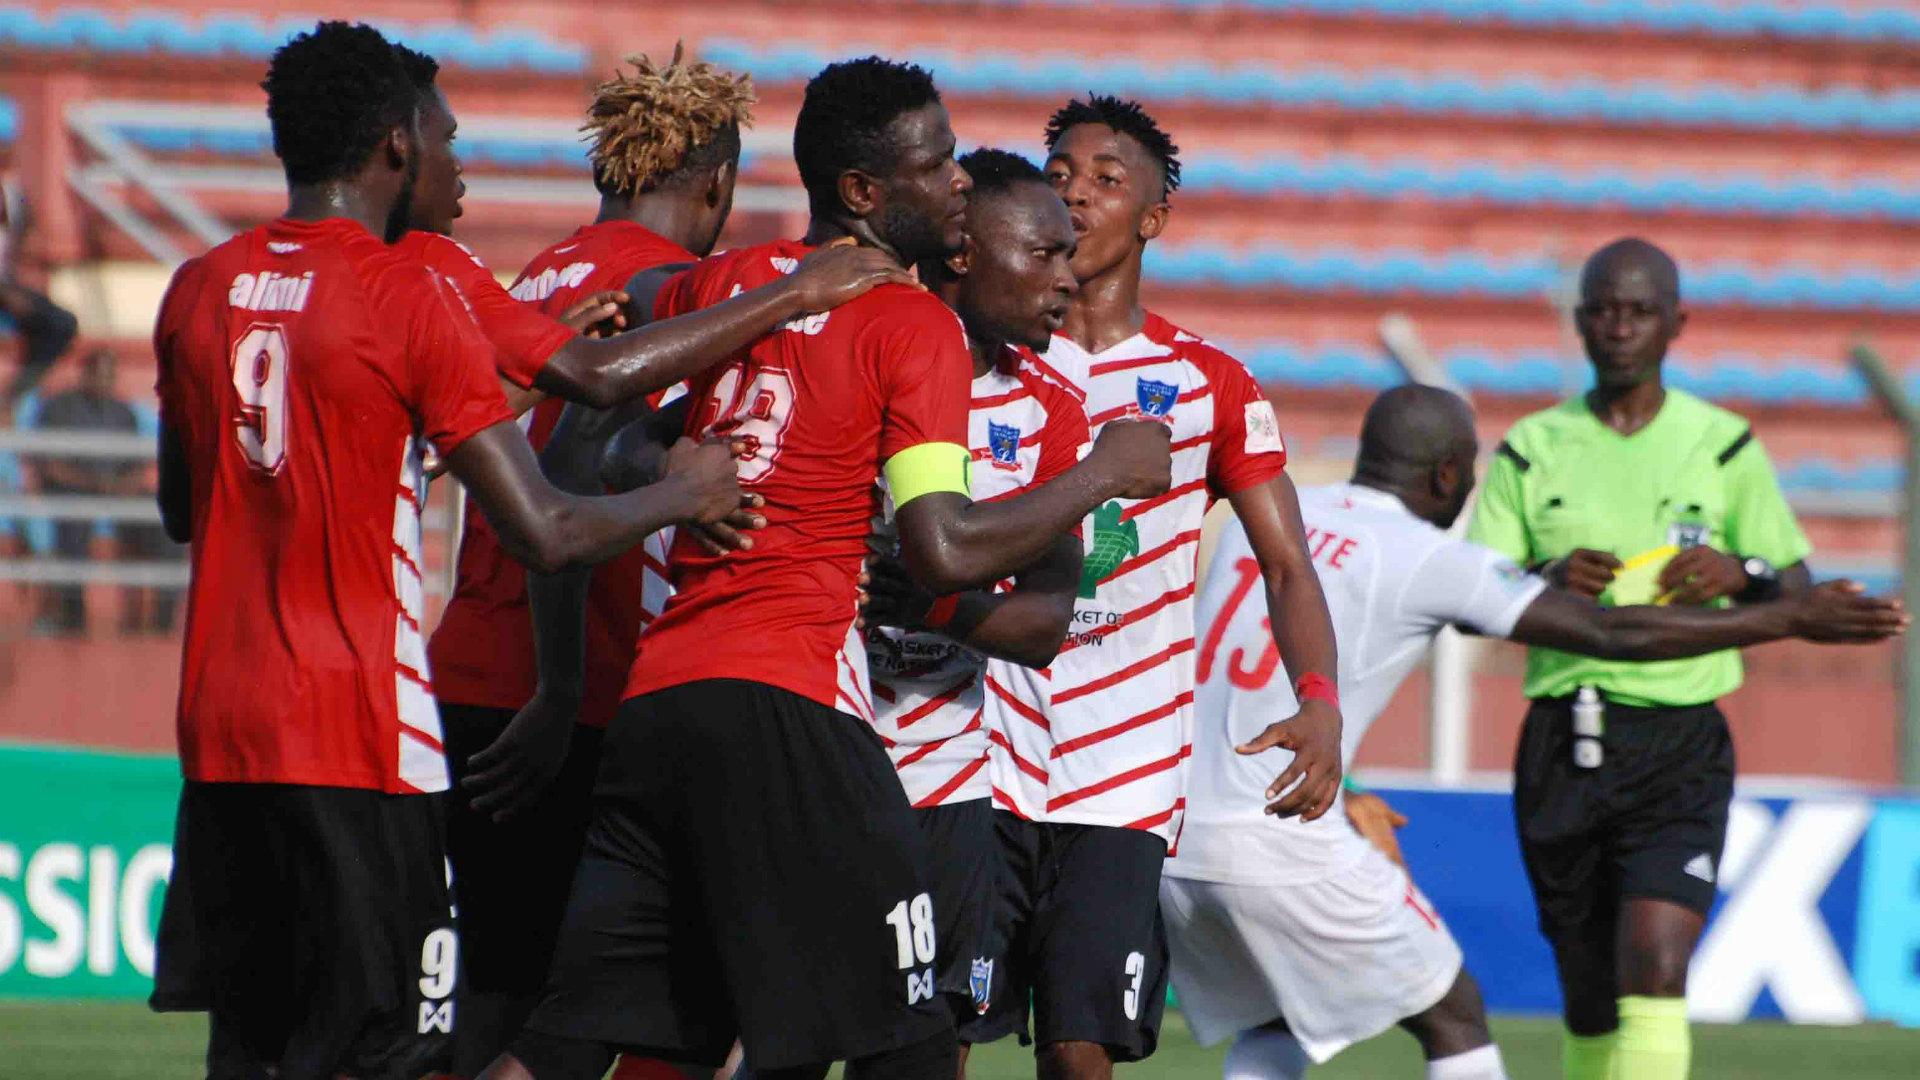 NPFL Wrap: Lobi Stars overtake Plateau United as league leaders